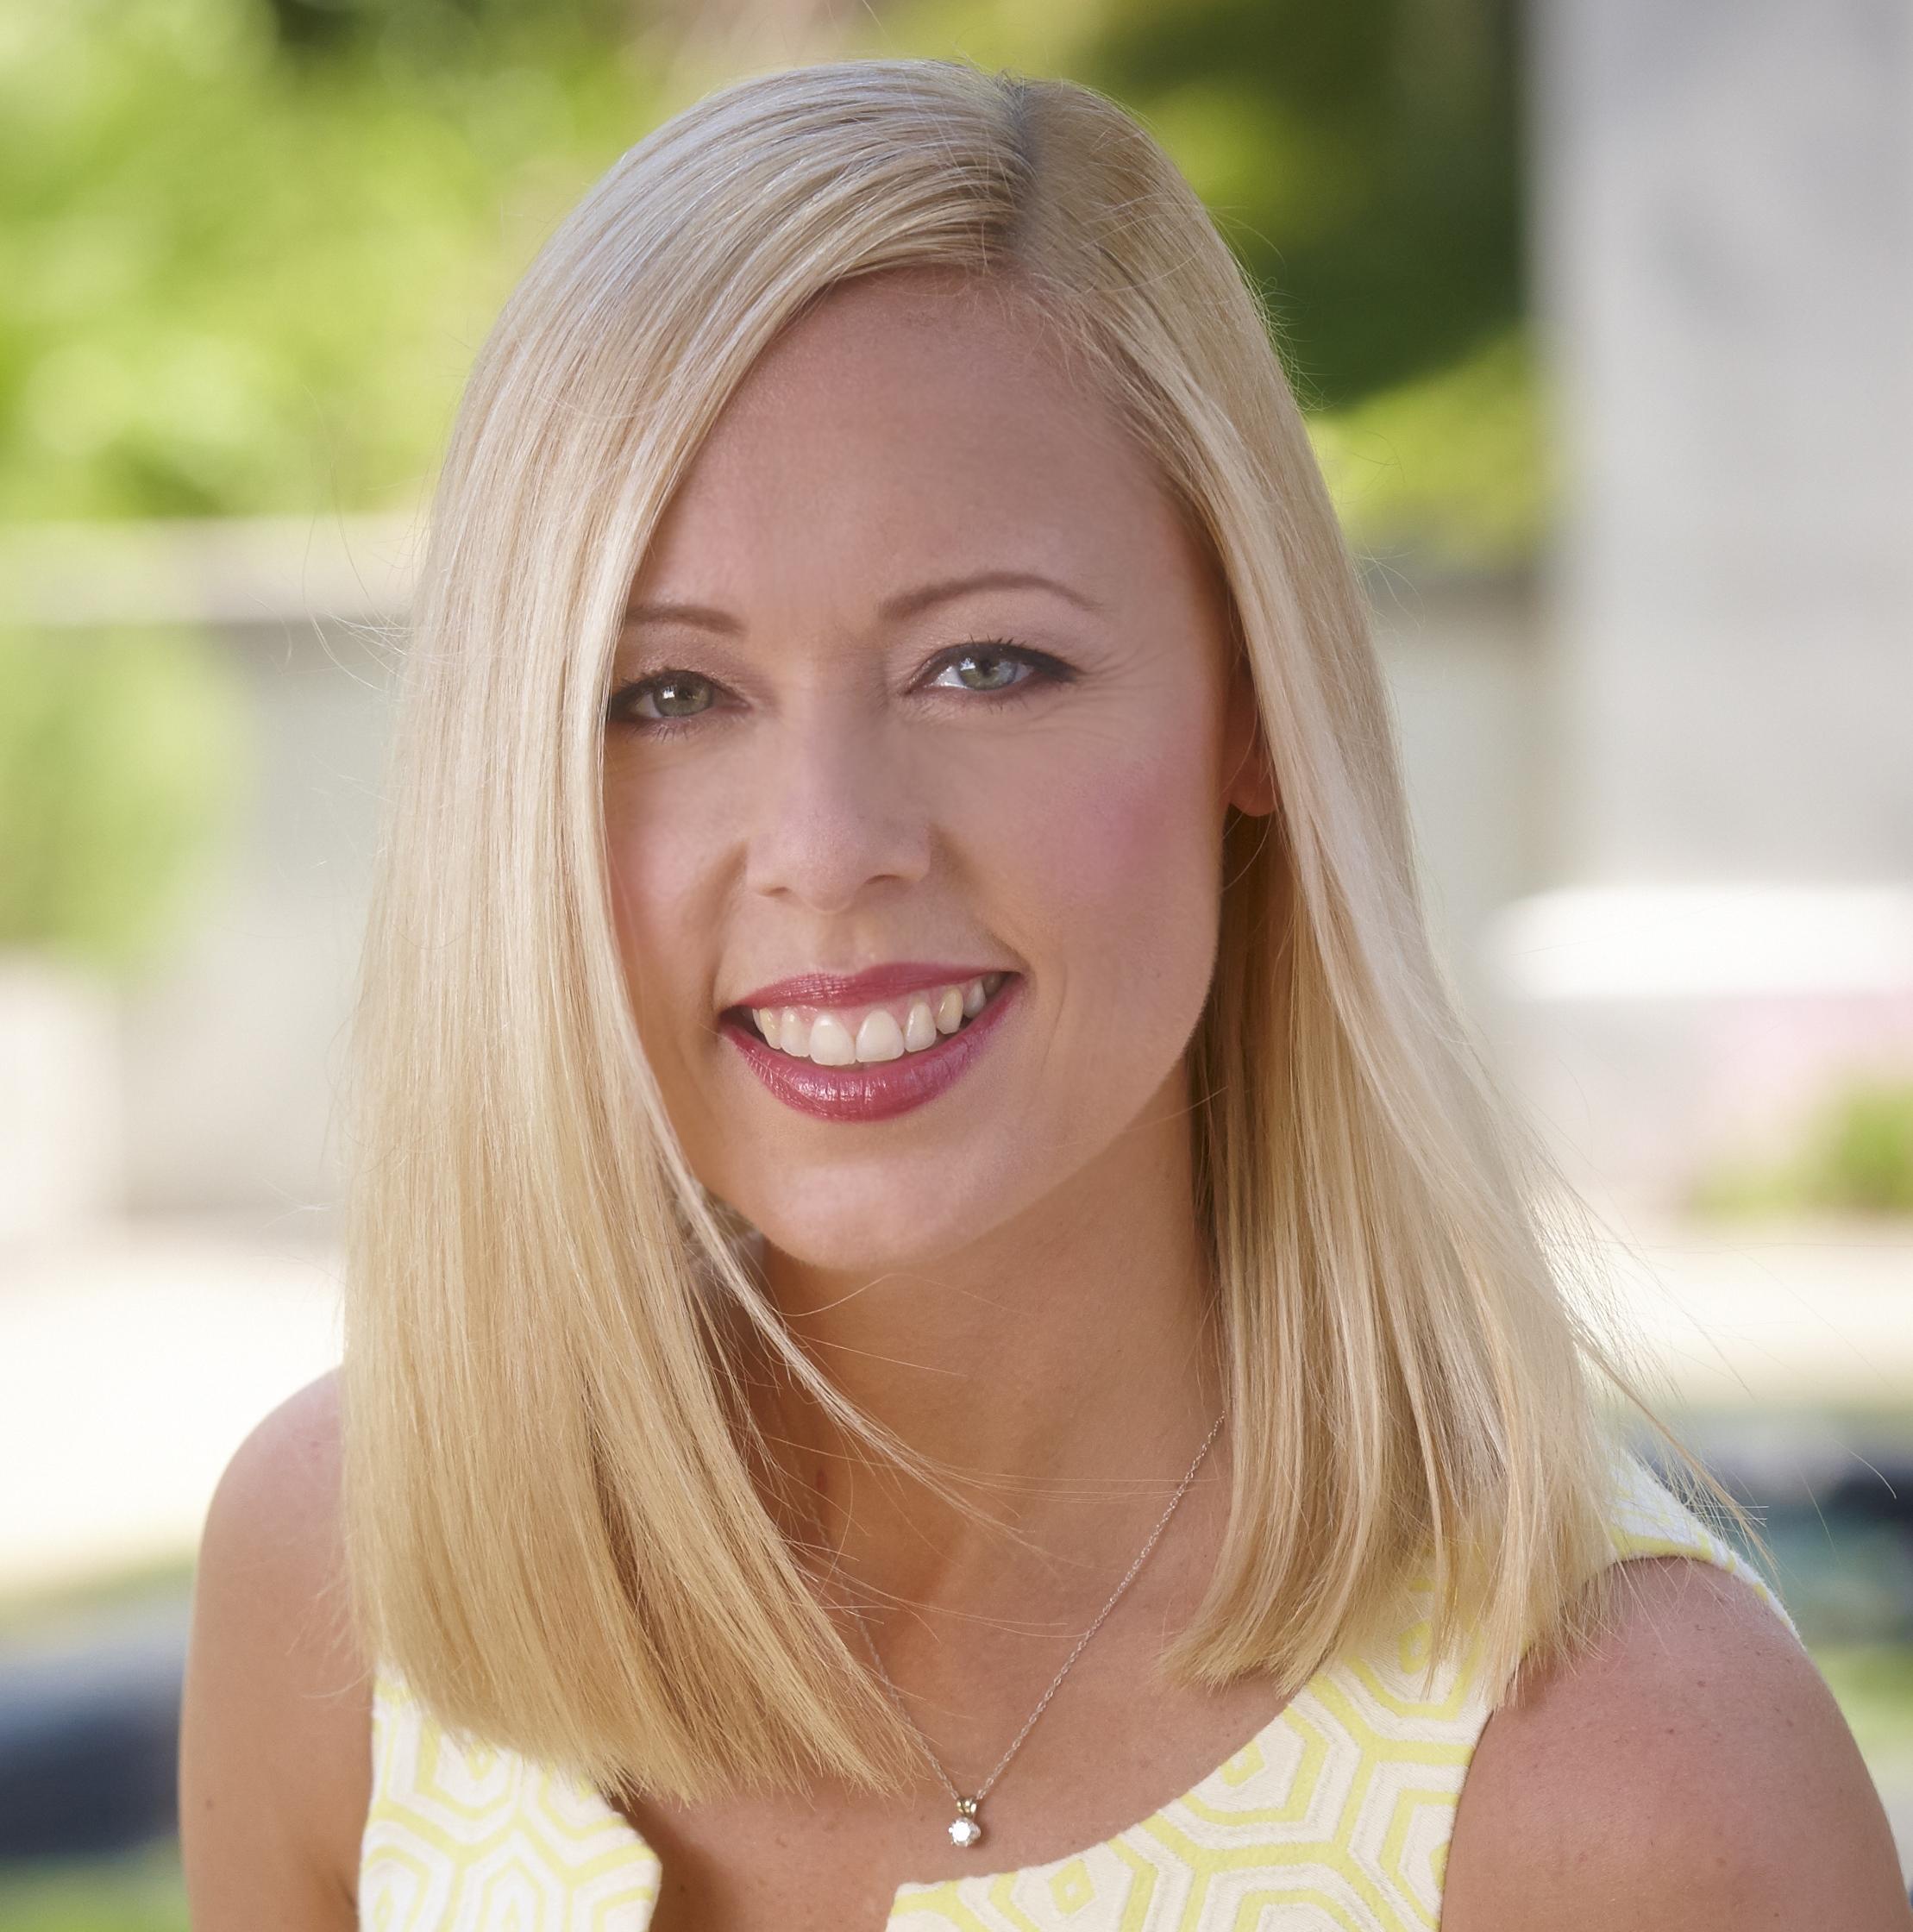 Southern Lifestyle Expert Rebecca Gordon Buttermilk Lipstick